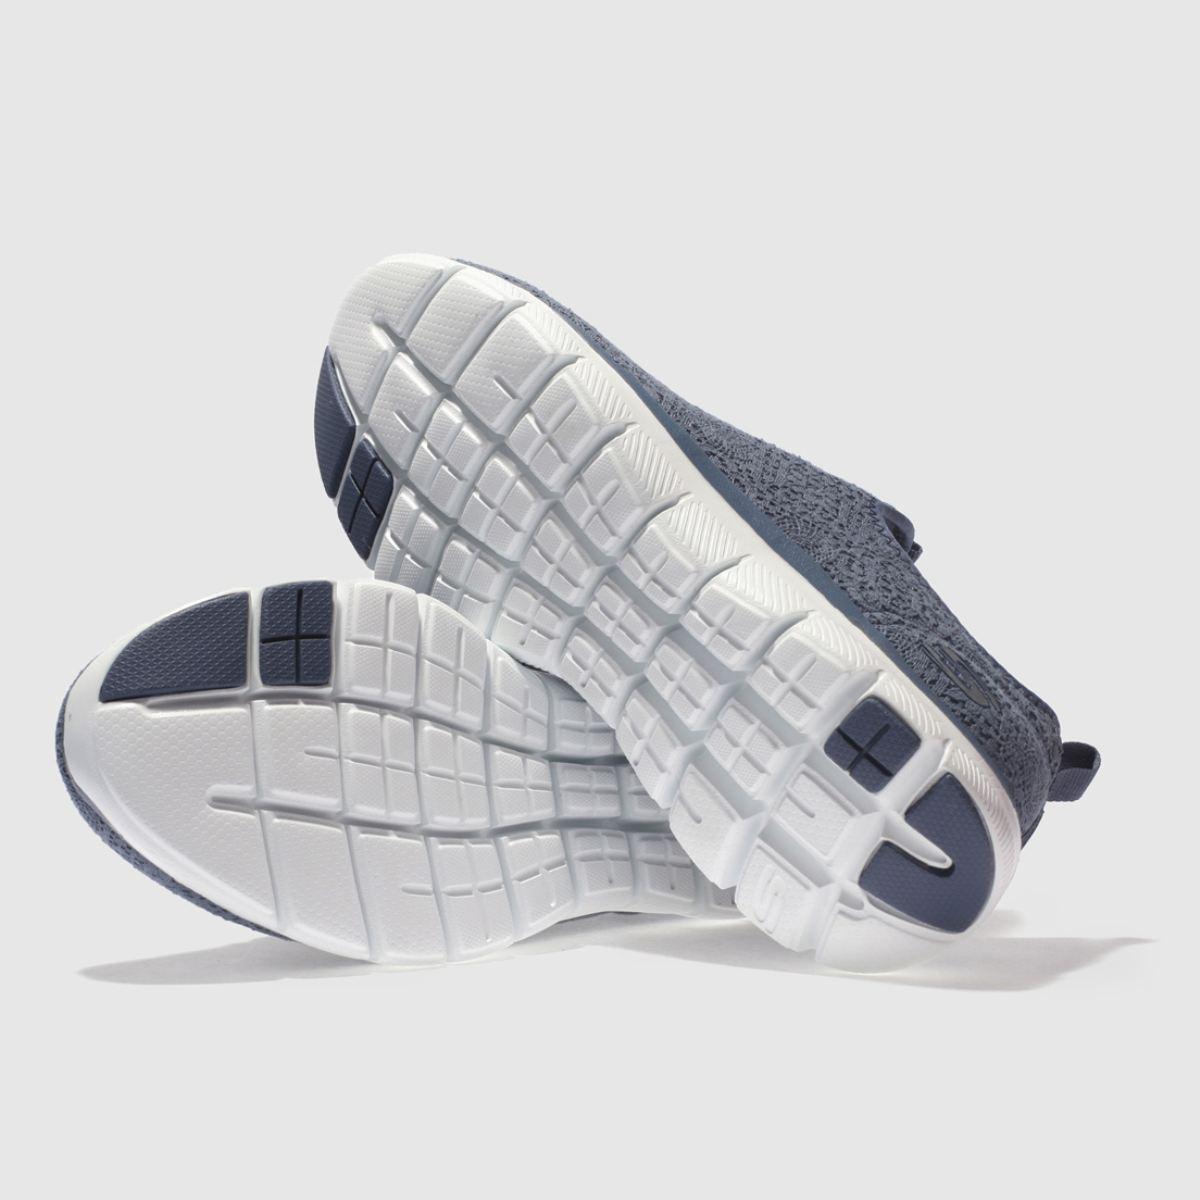 Damen Blau skechers Flex Appeal 2.0 Clear Cut Sneaker   Schuhe schuh Gute Qualität beliebte Schuhe   4b9c34